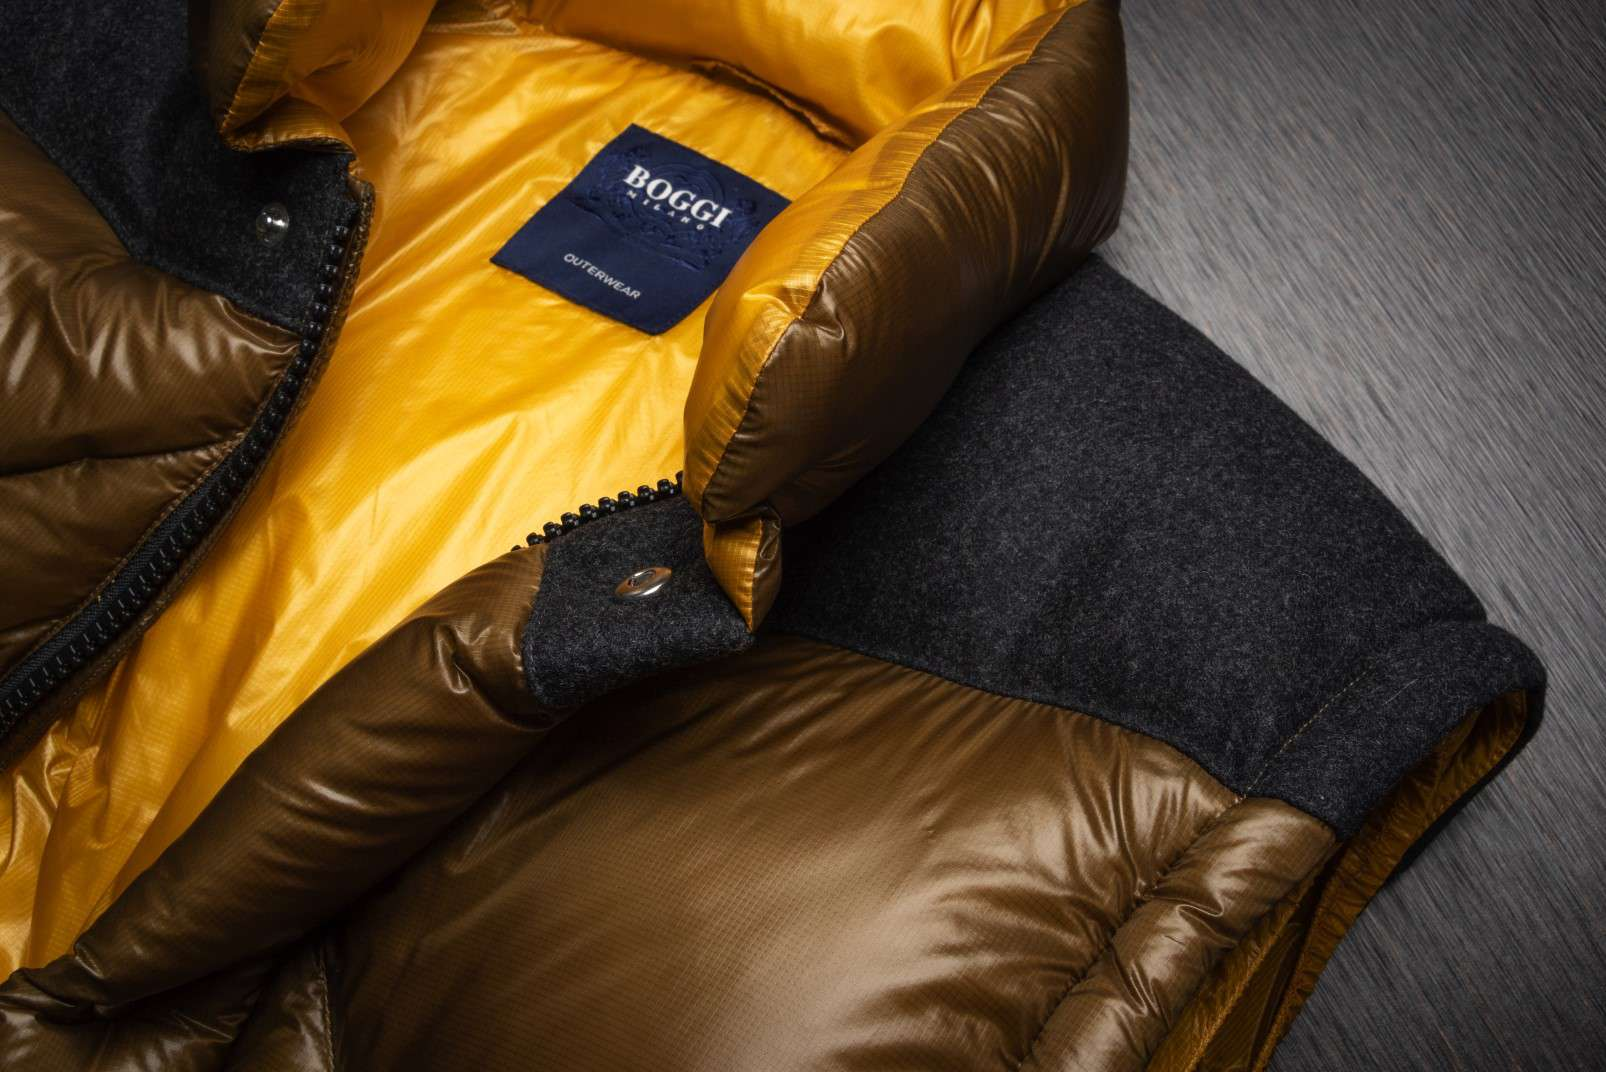 Boggi Milano ochre bomber jacket BO18A011704 collar